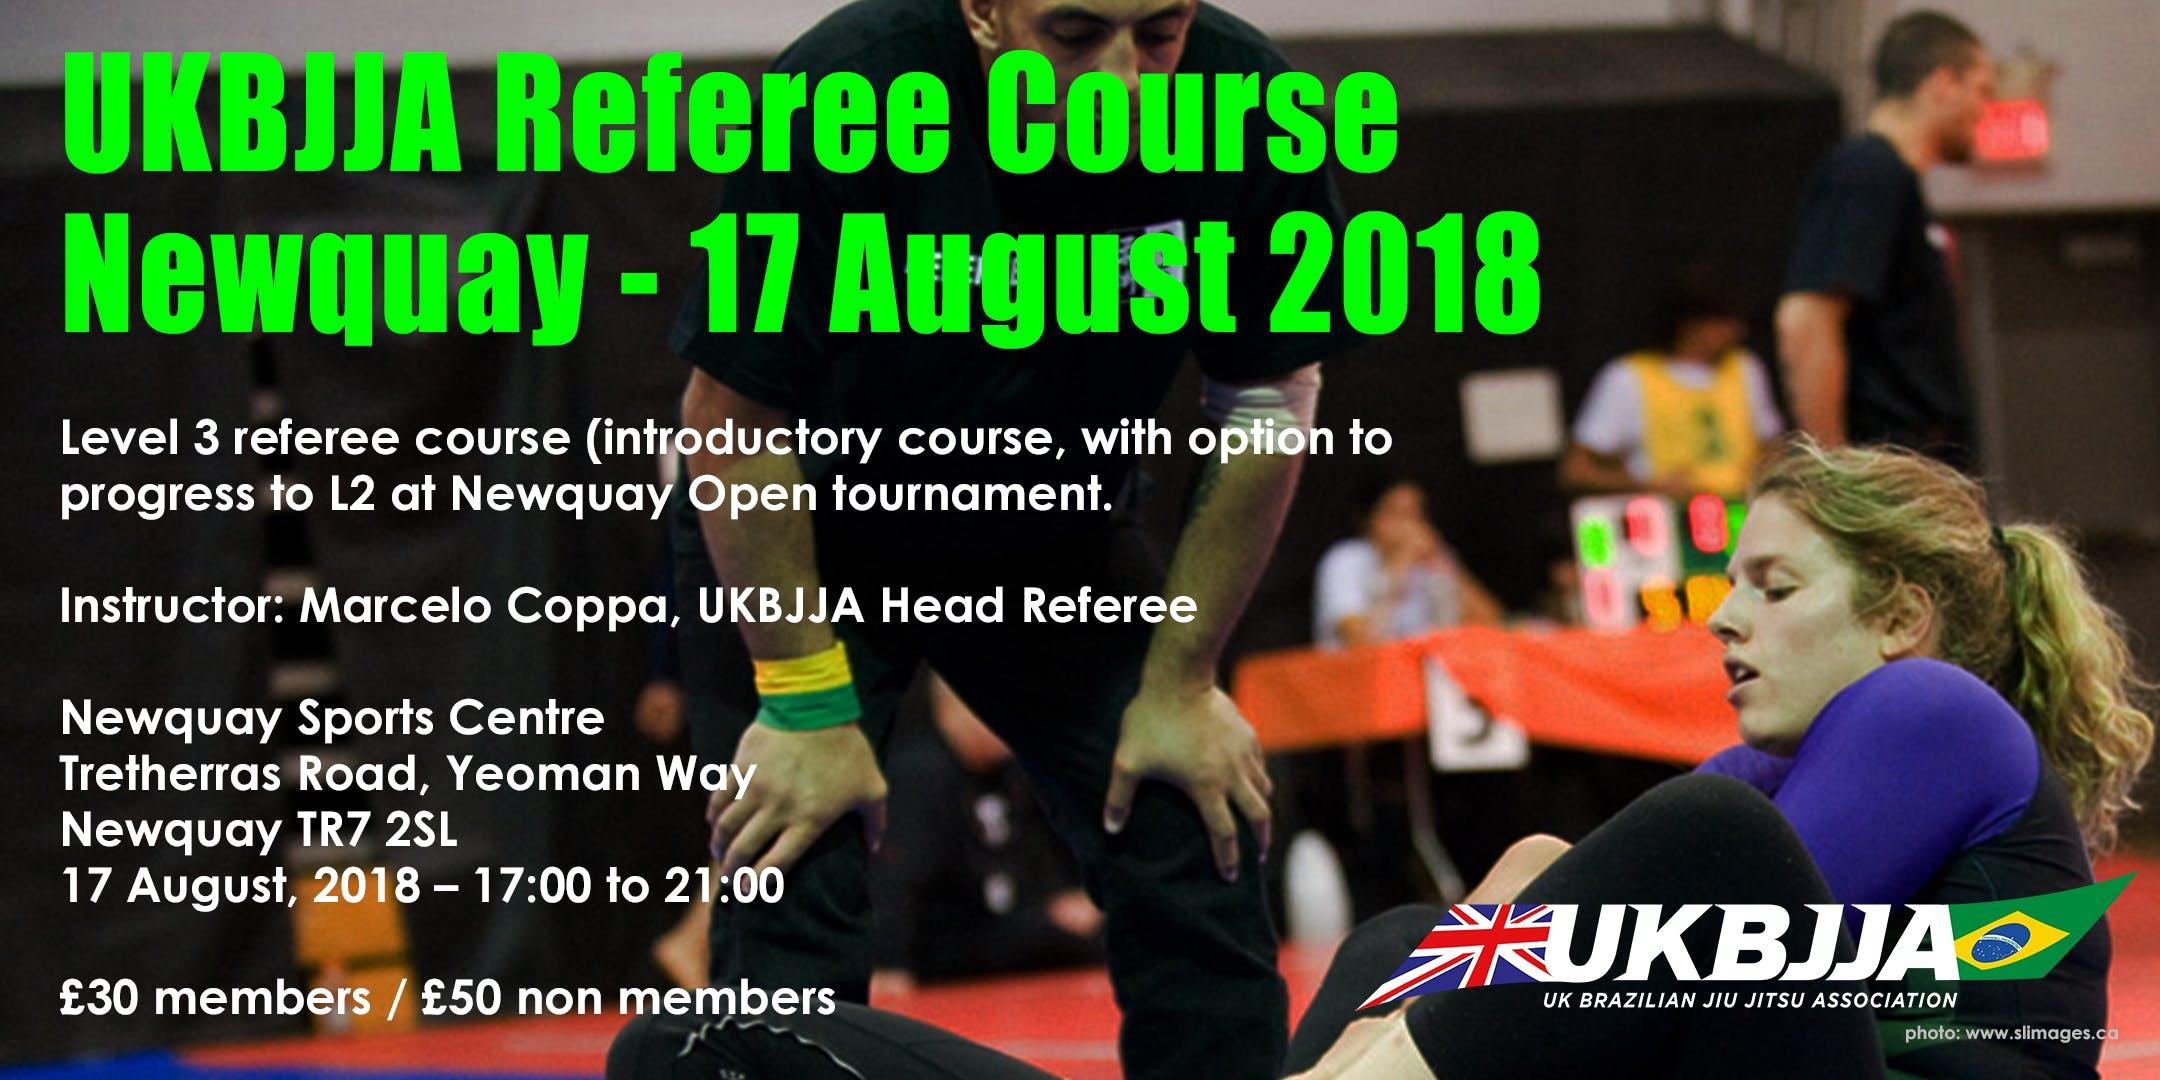 Brazilian Jiu Jitsu Referee Course - Level 3